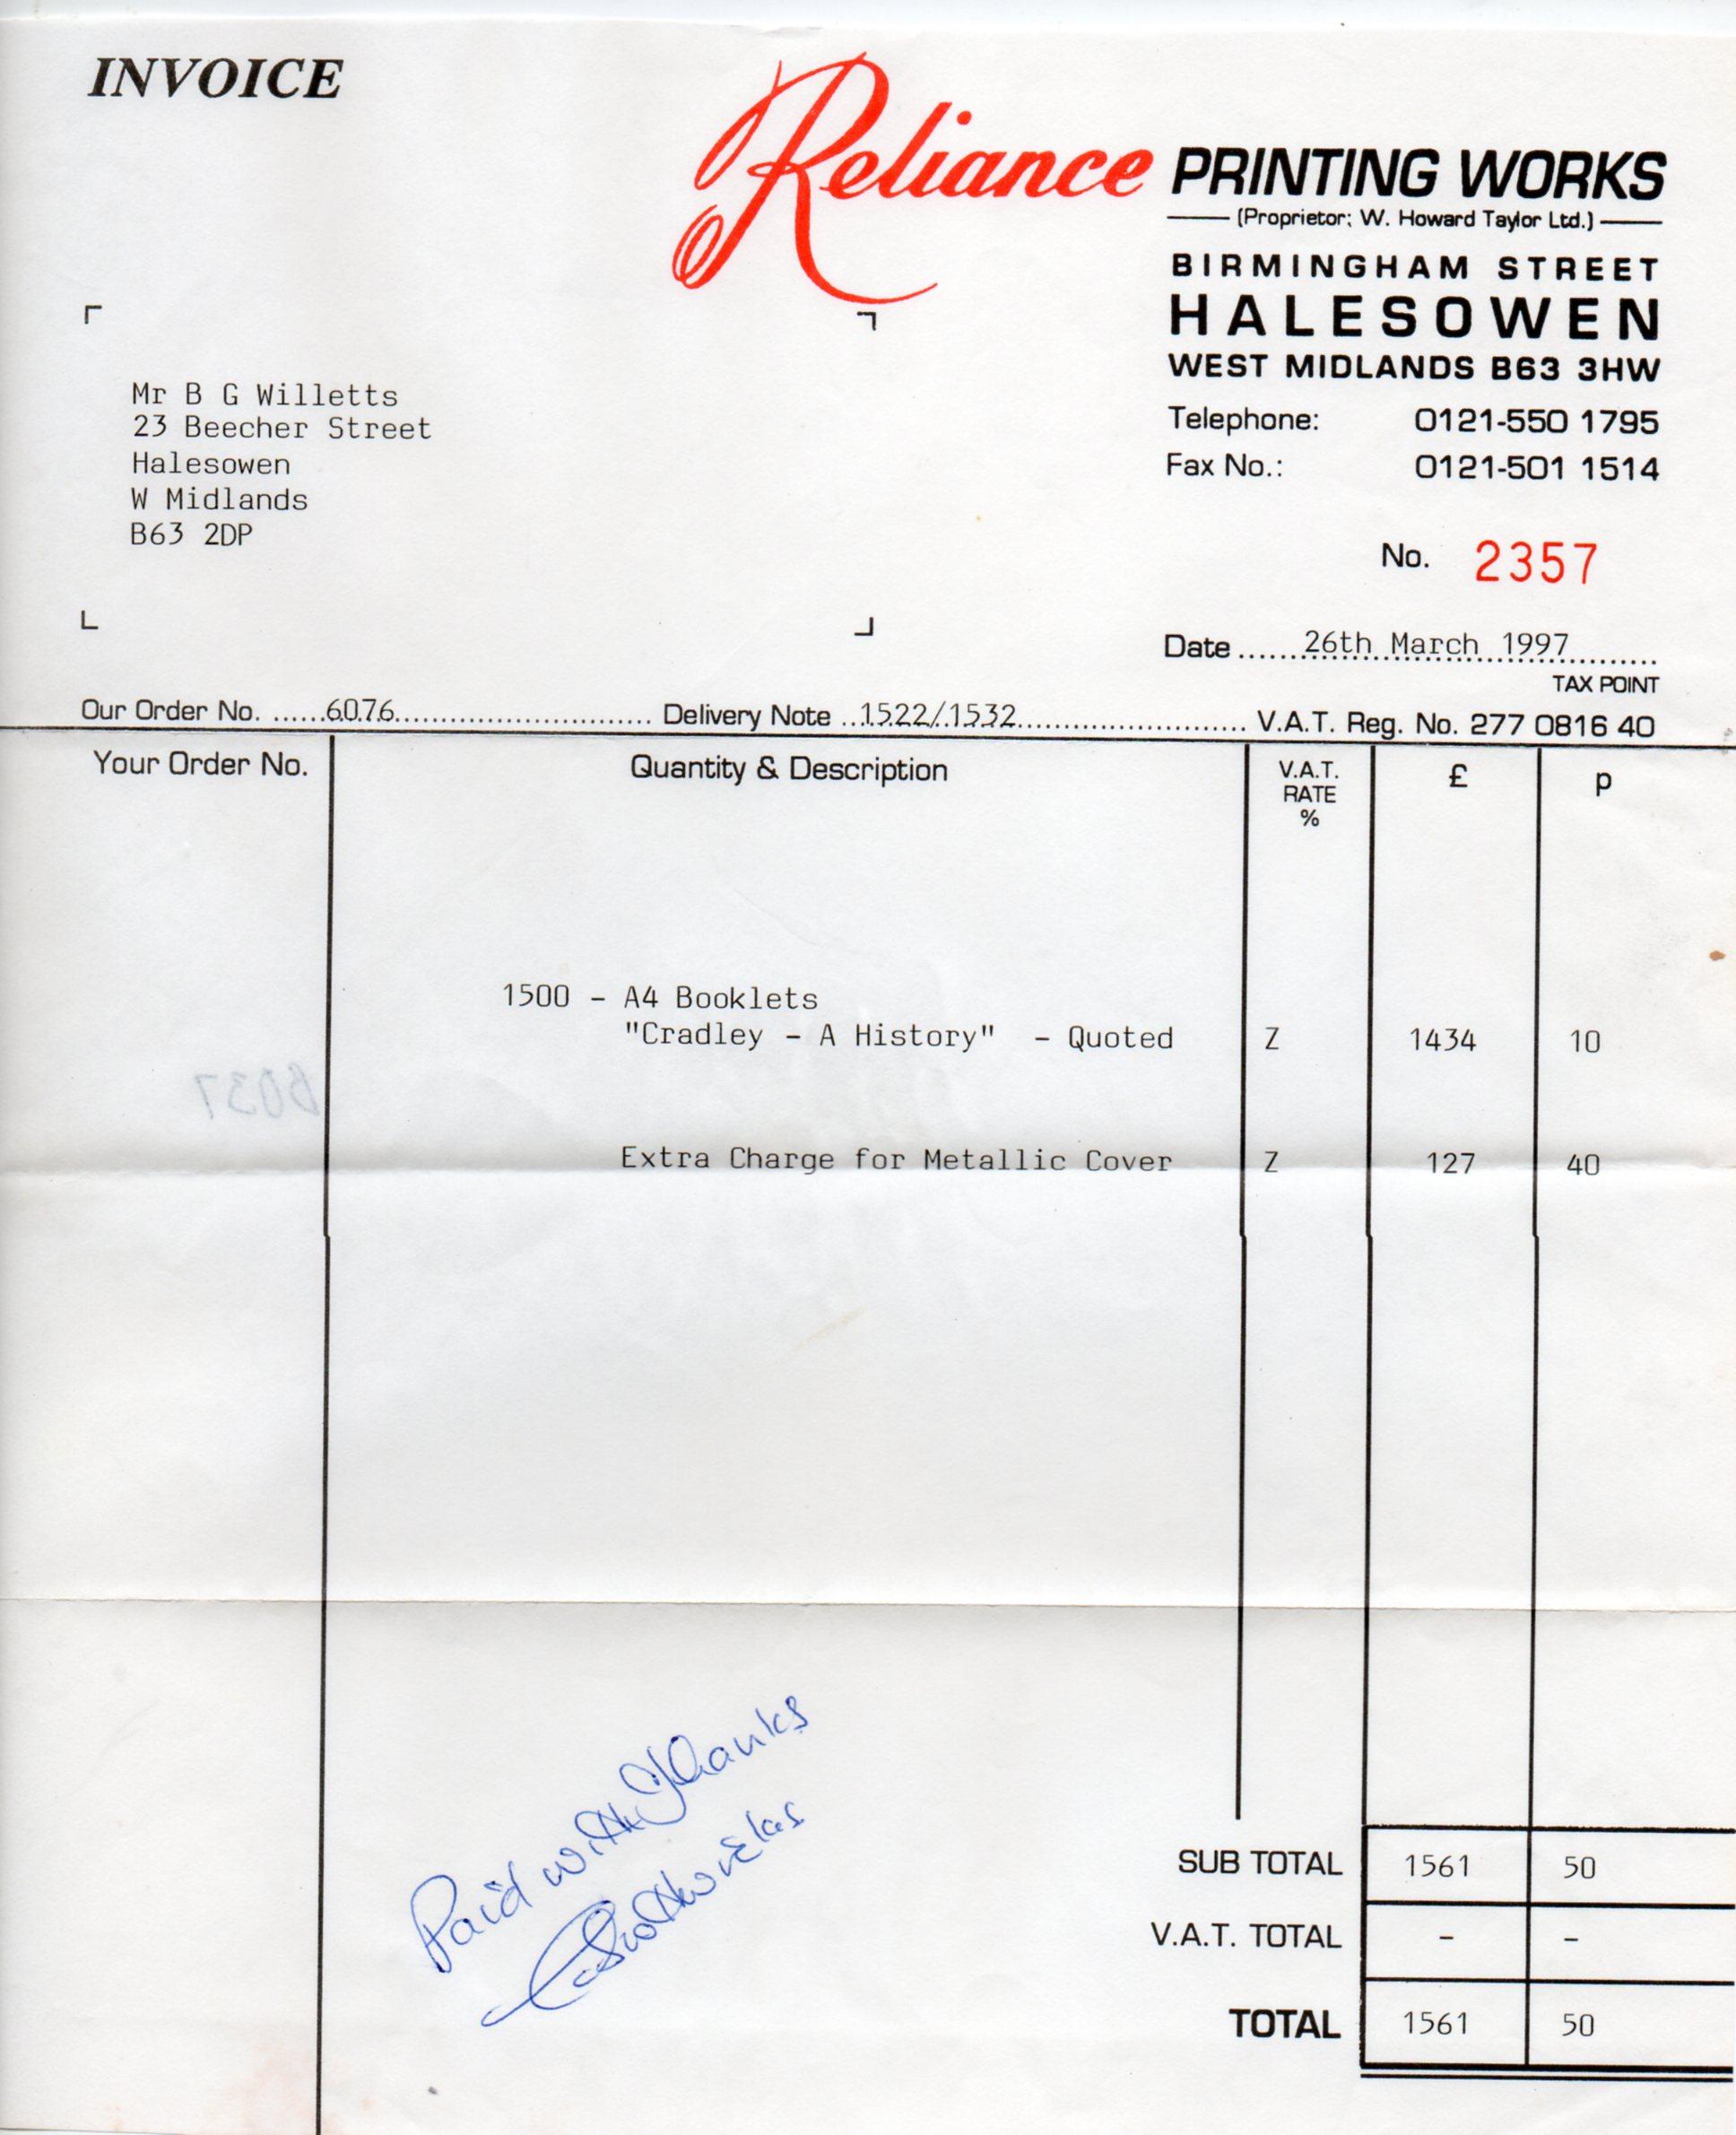 B037 Invoice [Cradley History]